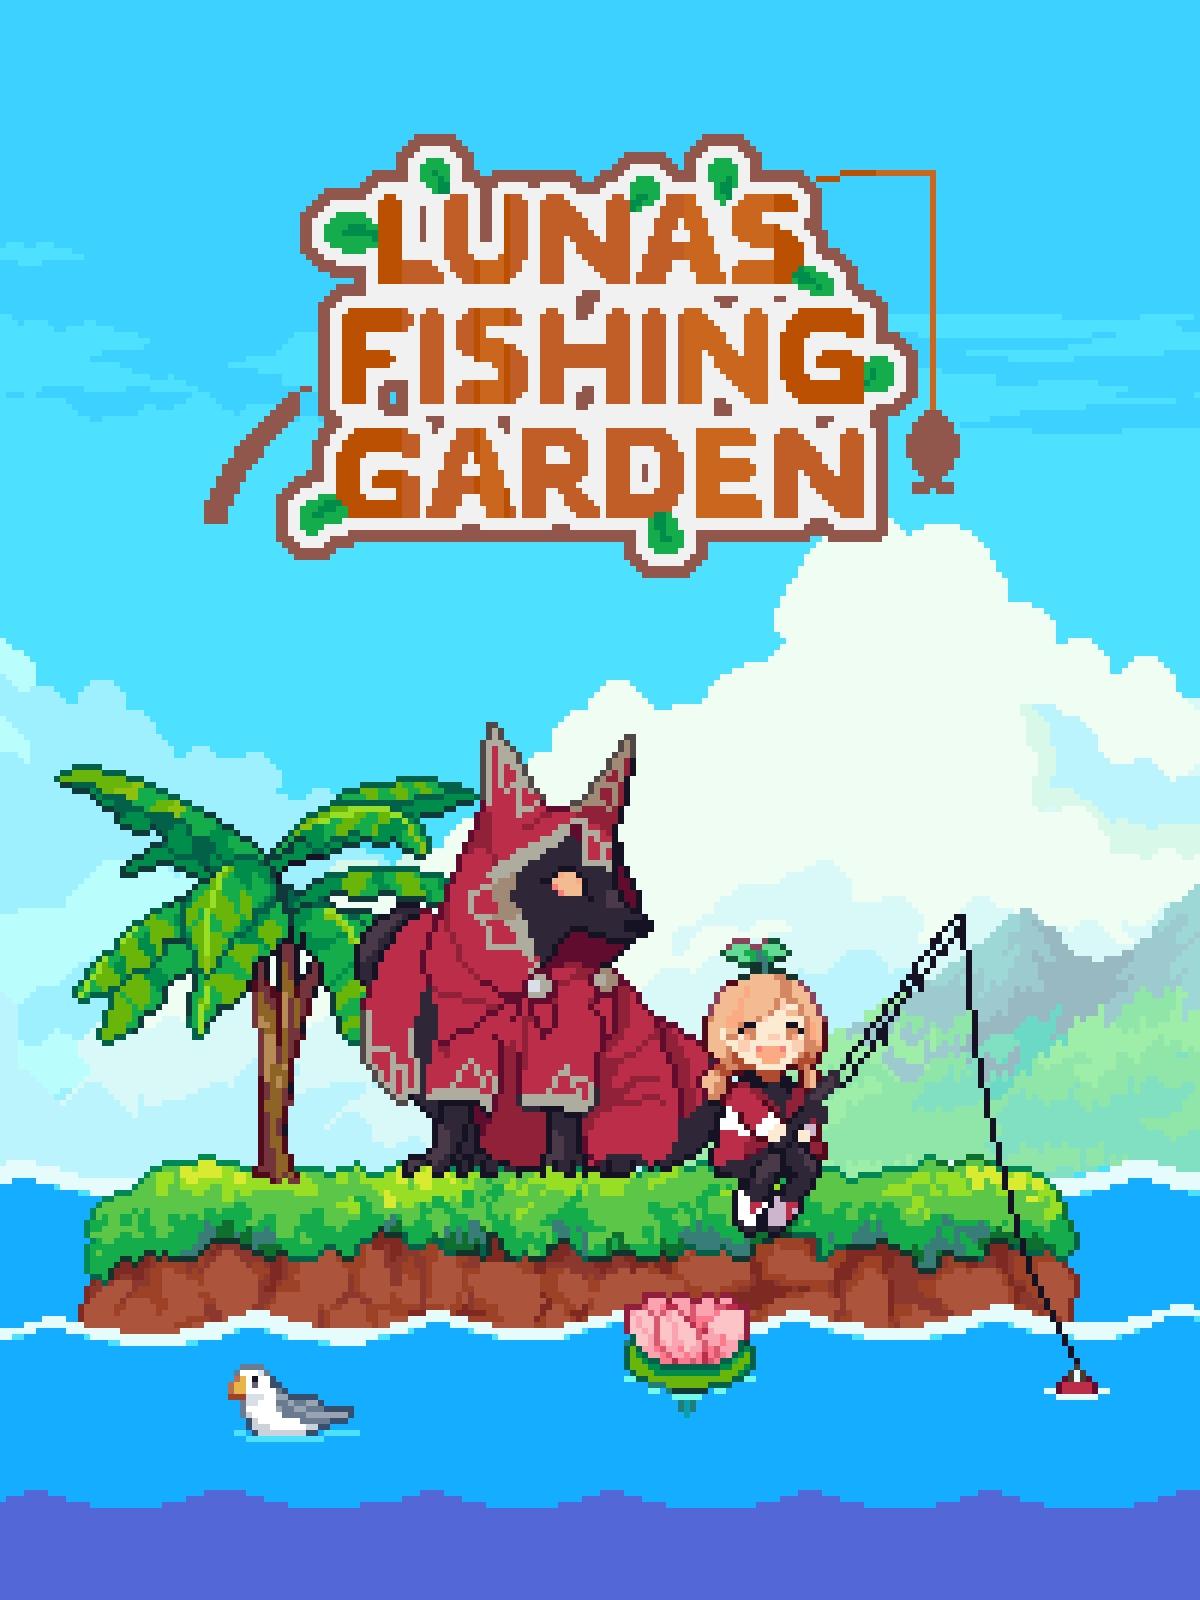 Luna's Fishing Garden